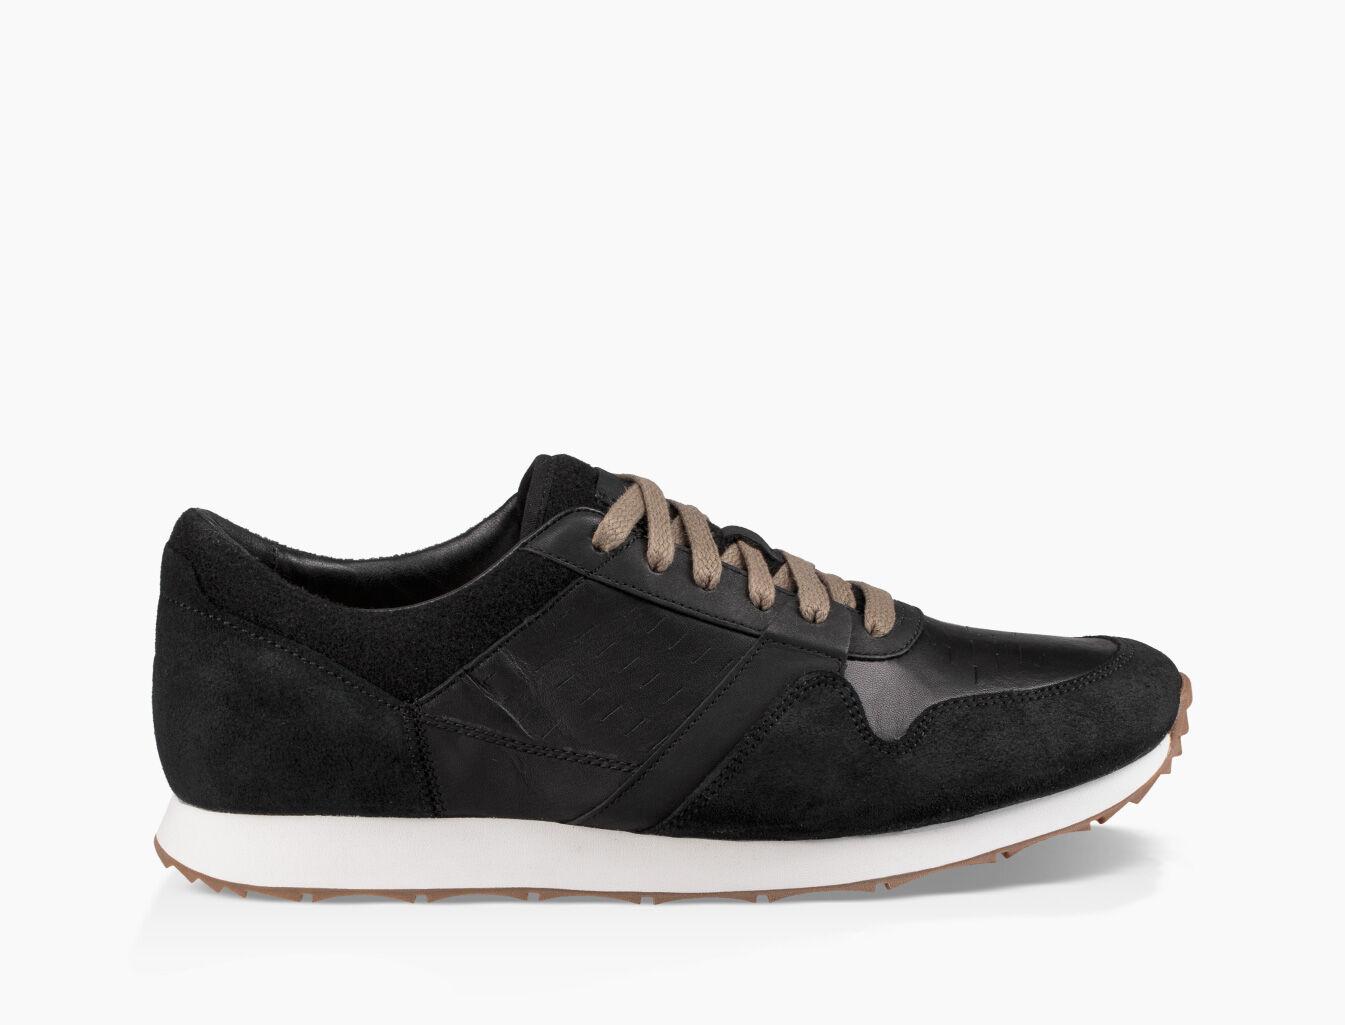 Zoom Trigo Sneaker - Image 1 of 6